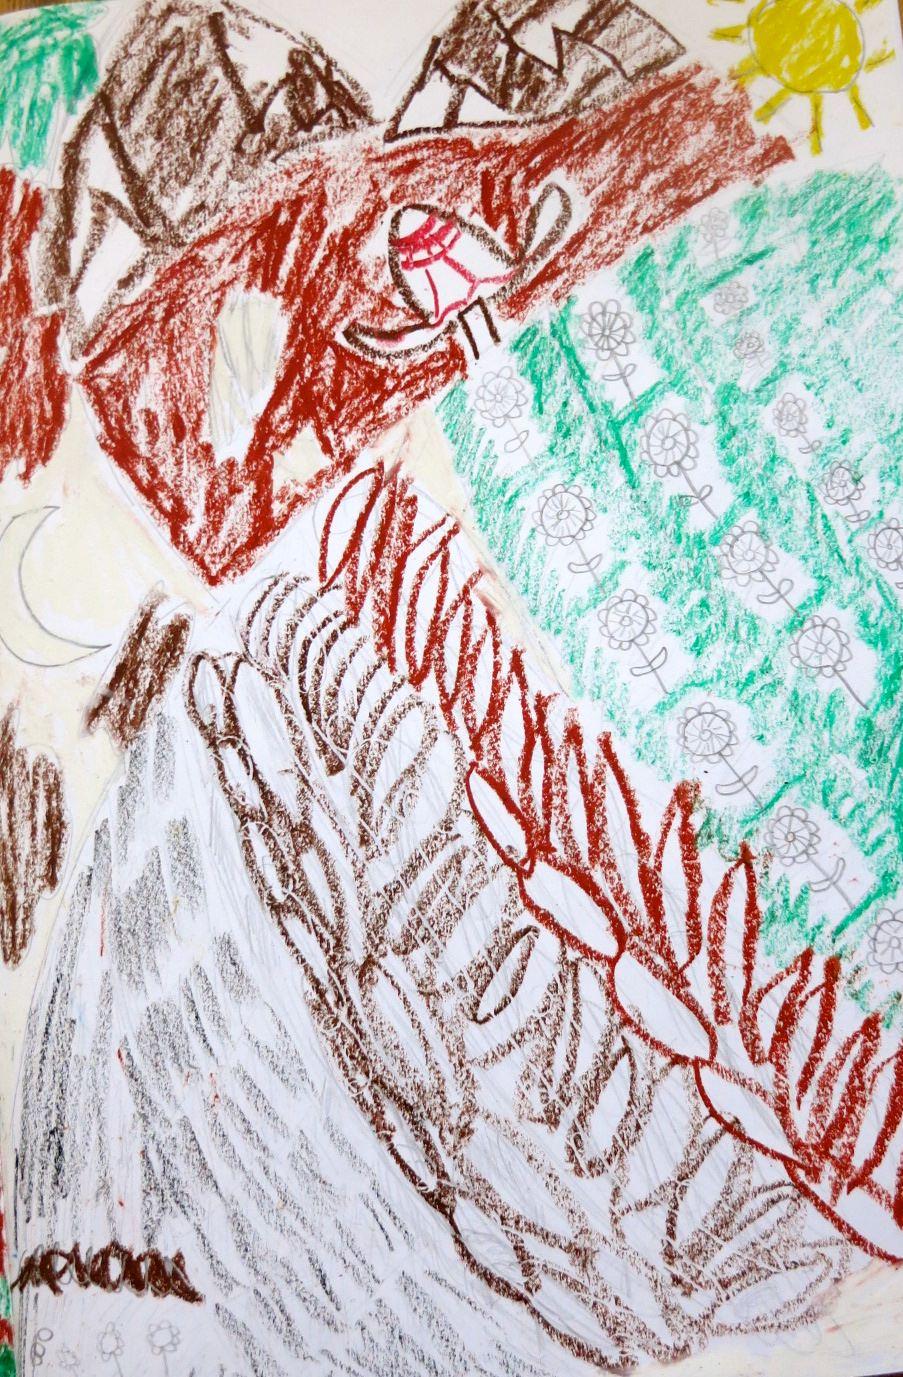 """Spring kindles into summer."" Illustration by George B-N, Year 8, Sompting Abbotts Preparatory School"